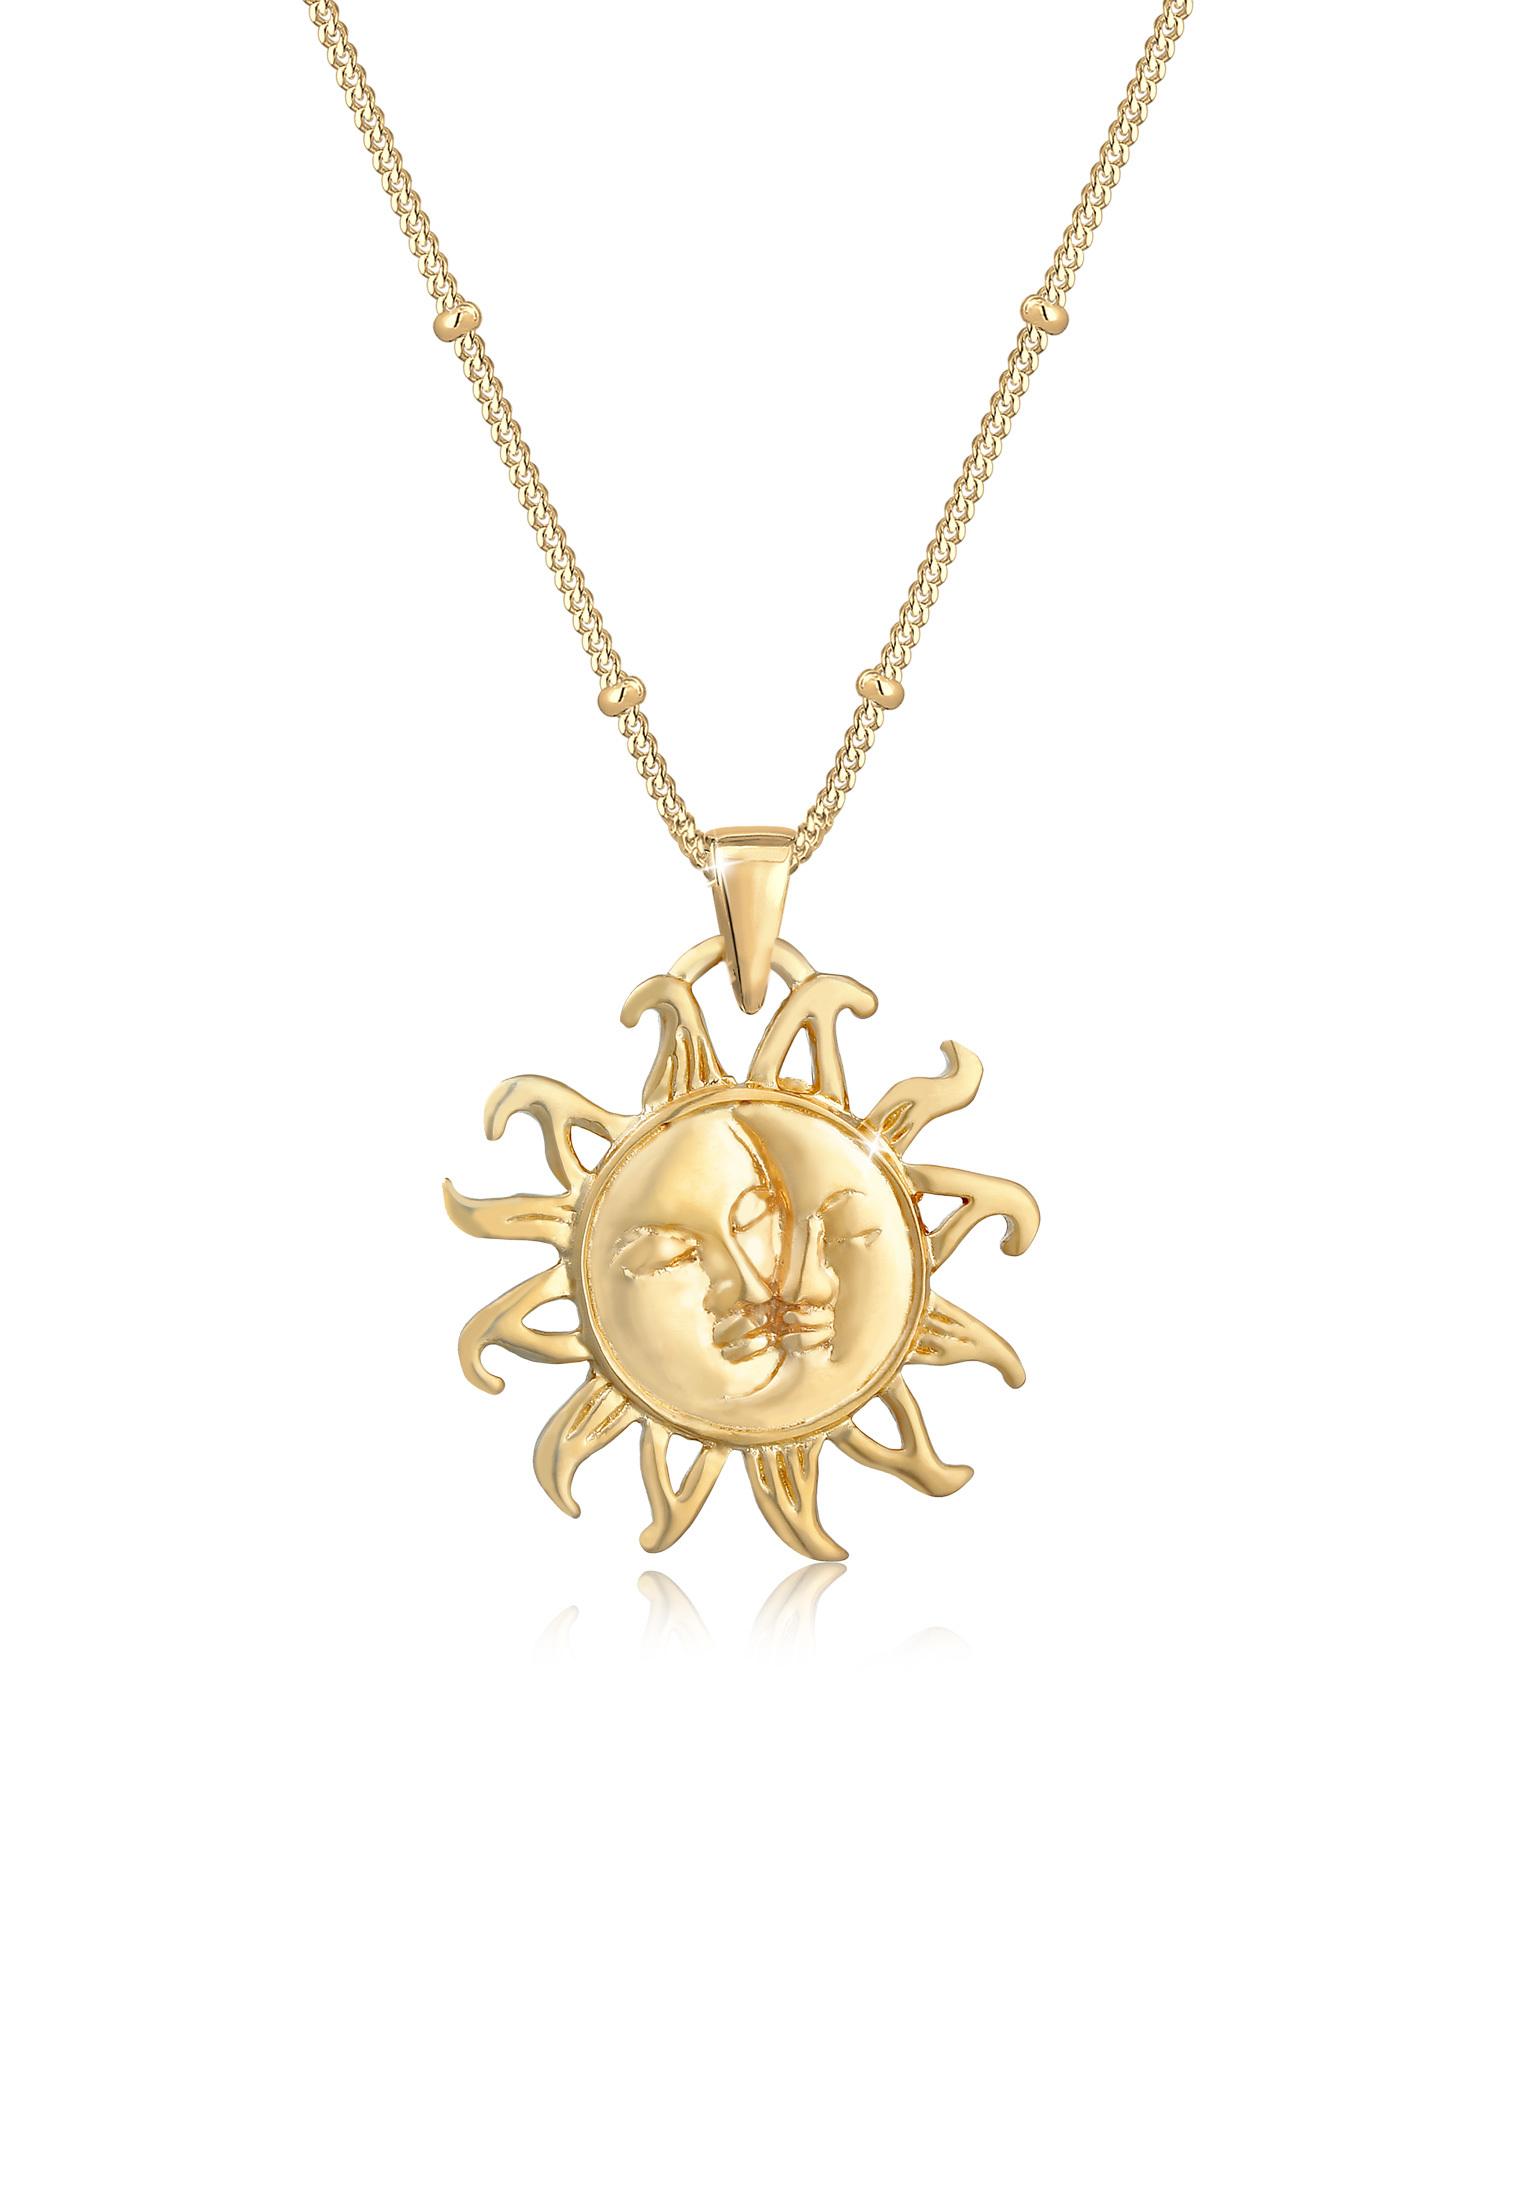 Kugel-Halskette Halbmond   925 Sterling Silber vergoldet